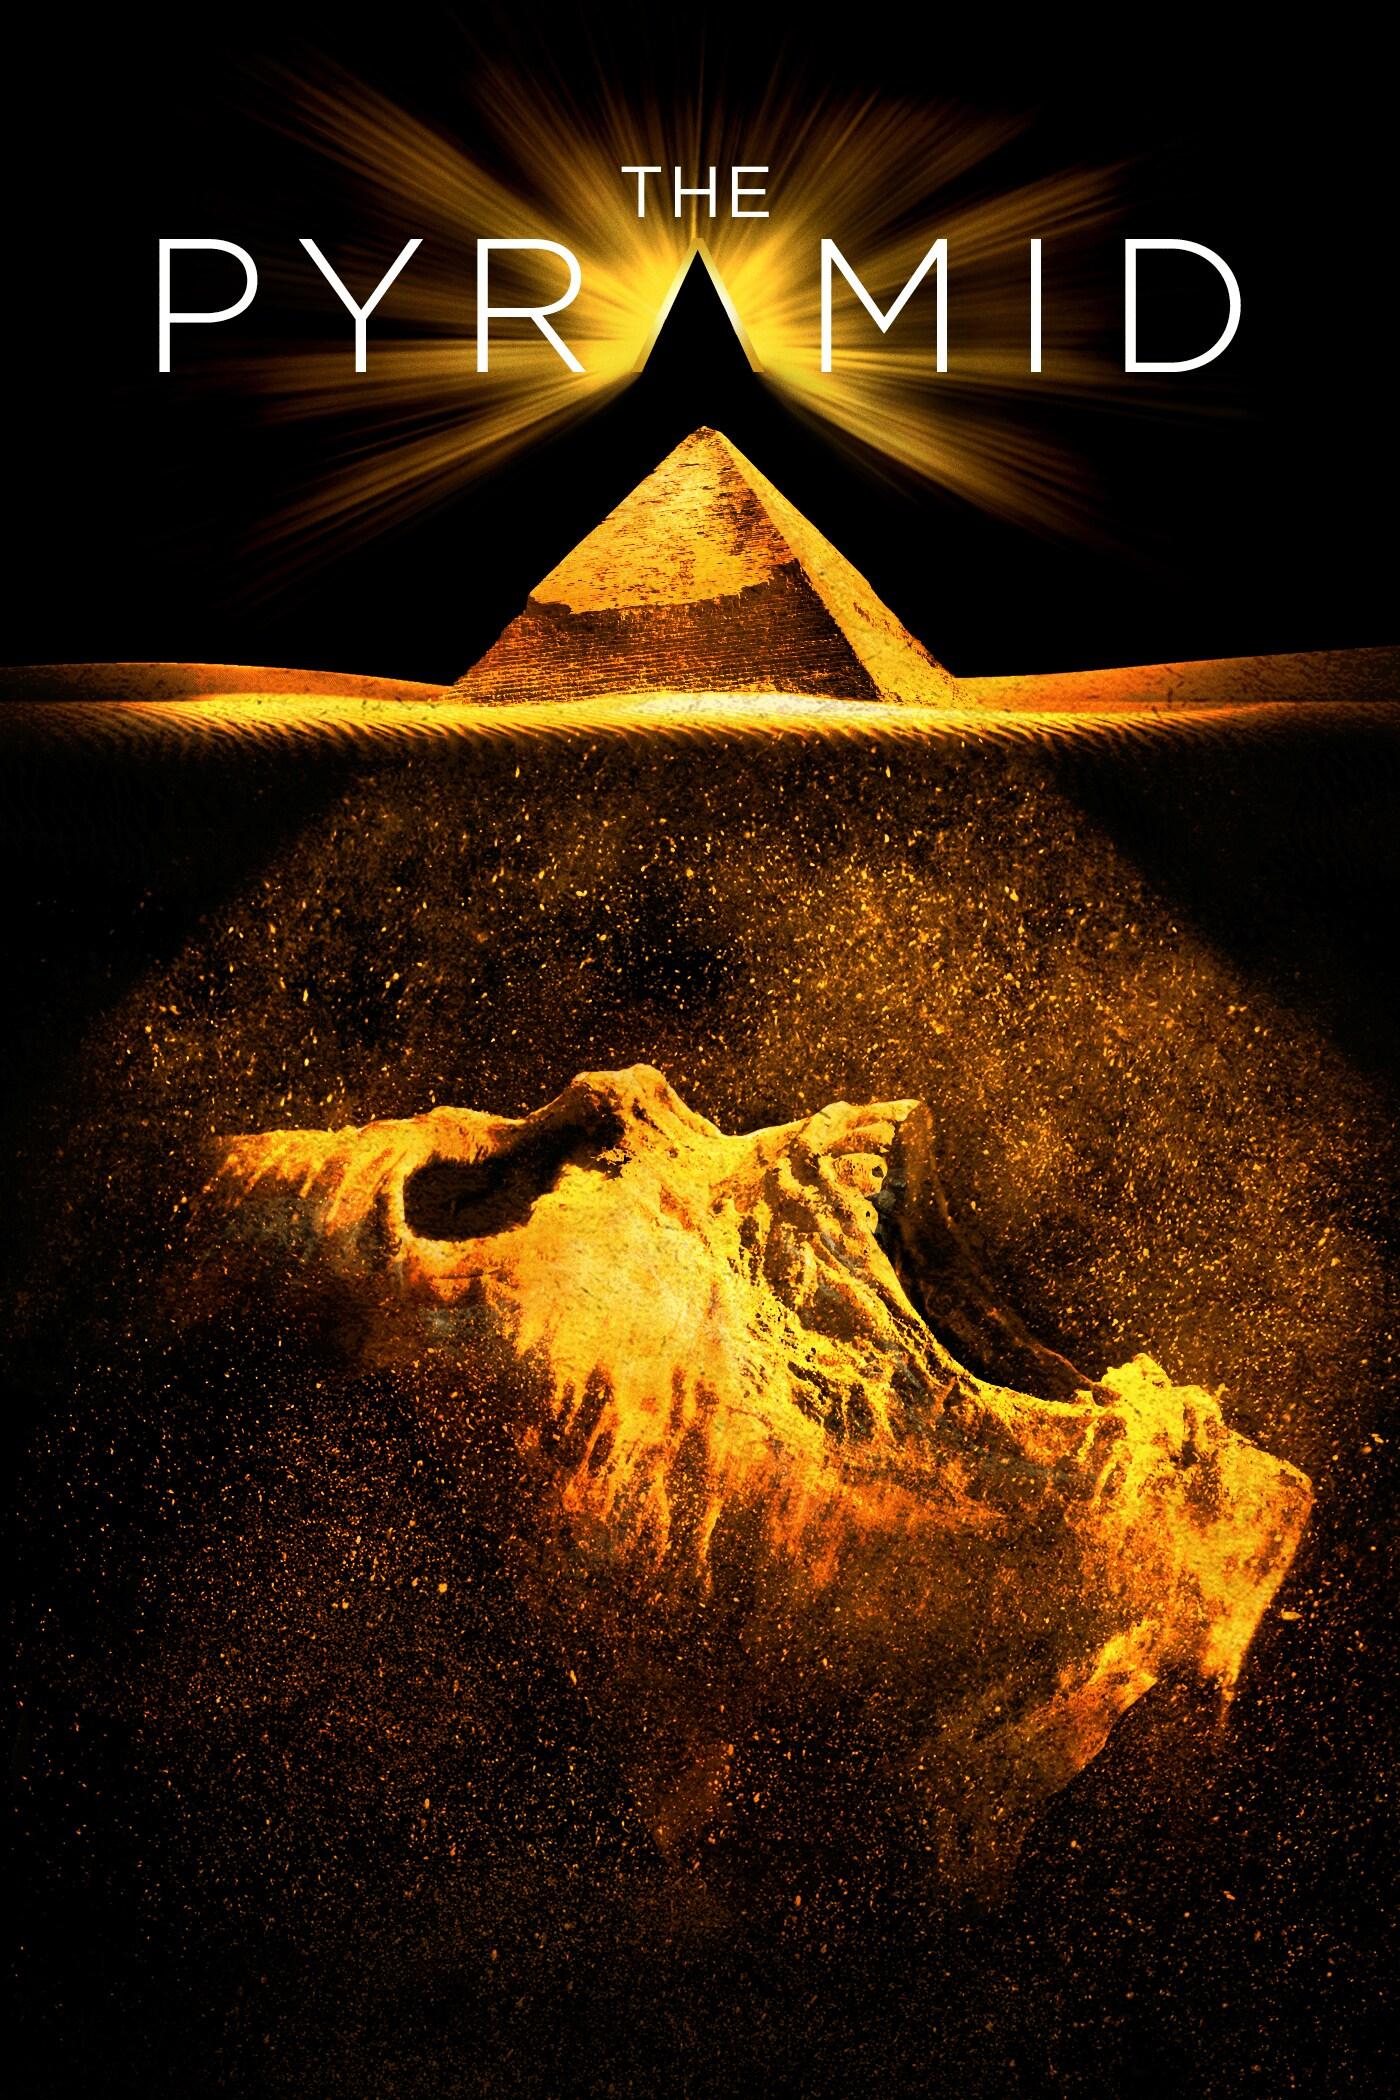 The Pyramid movie poster